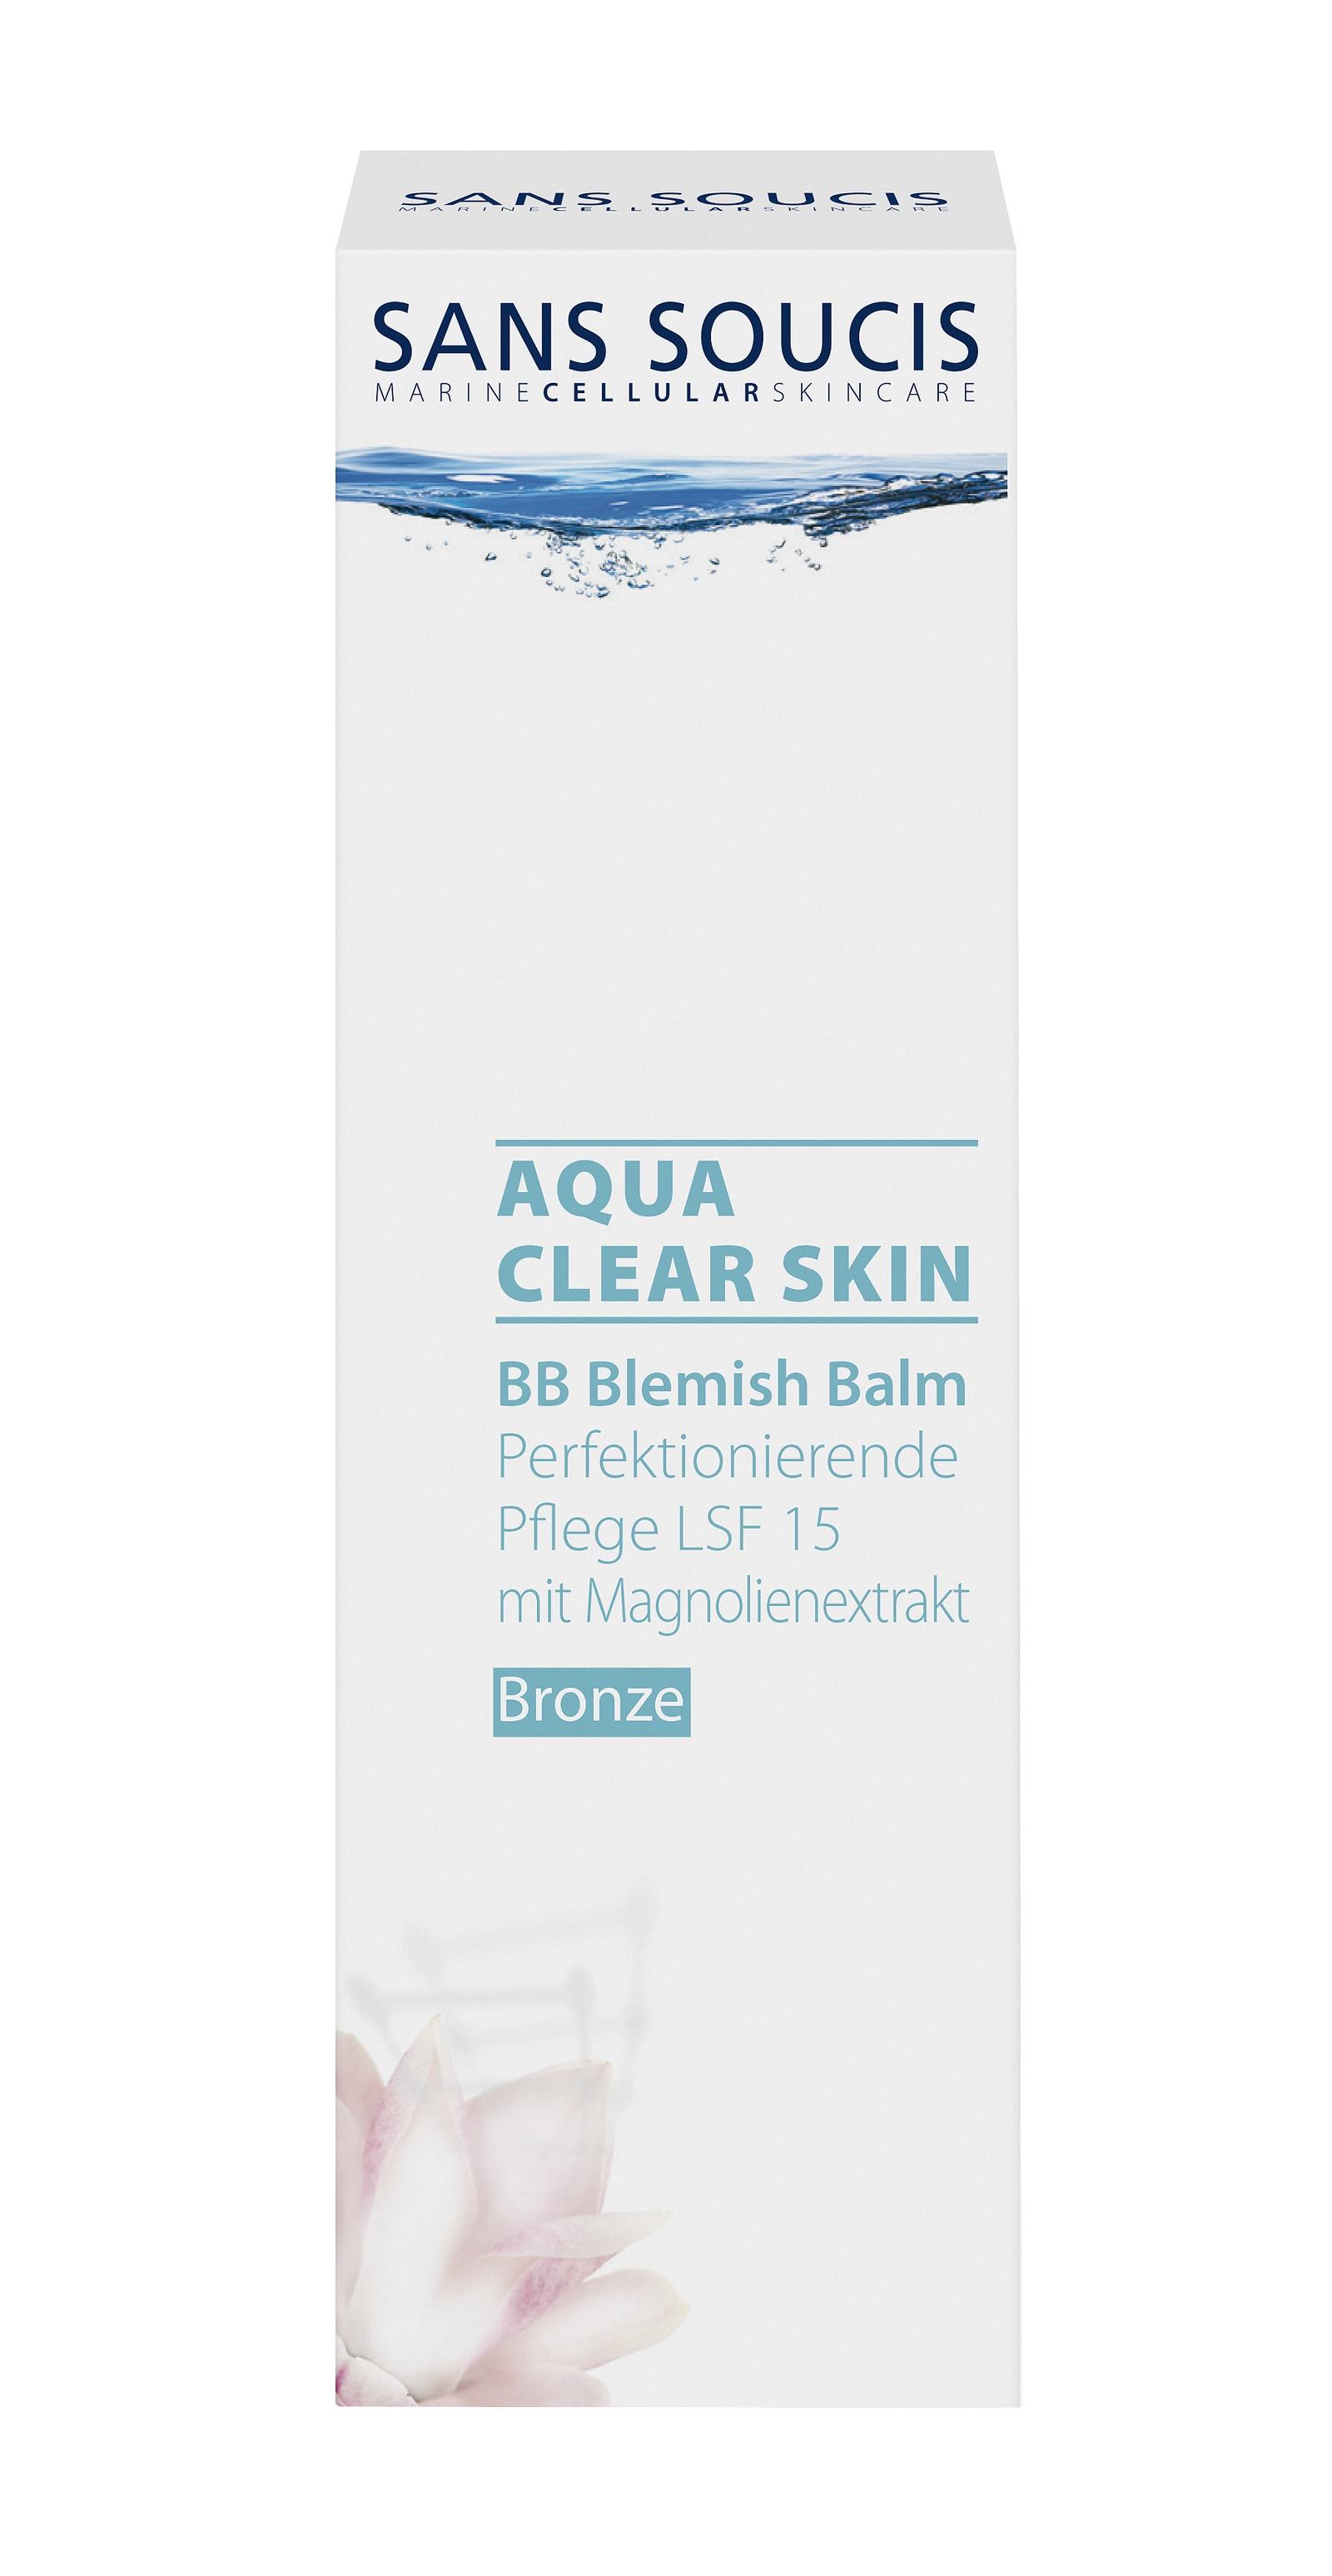 BB-крем Sans Soucis Aqua Clear Skin, бронзовый, 40 мл the skin house multi function smart bb солнцезащитный вв крем 30 мл